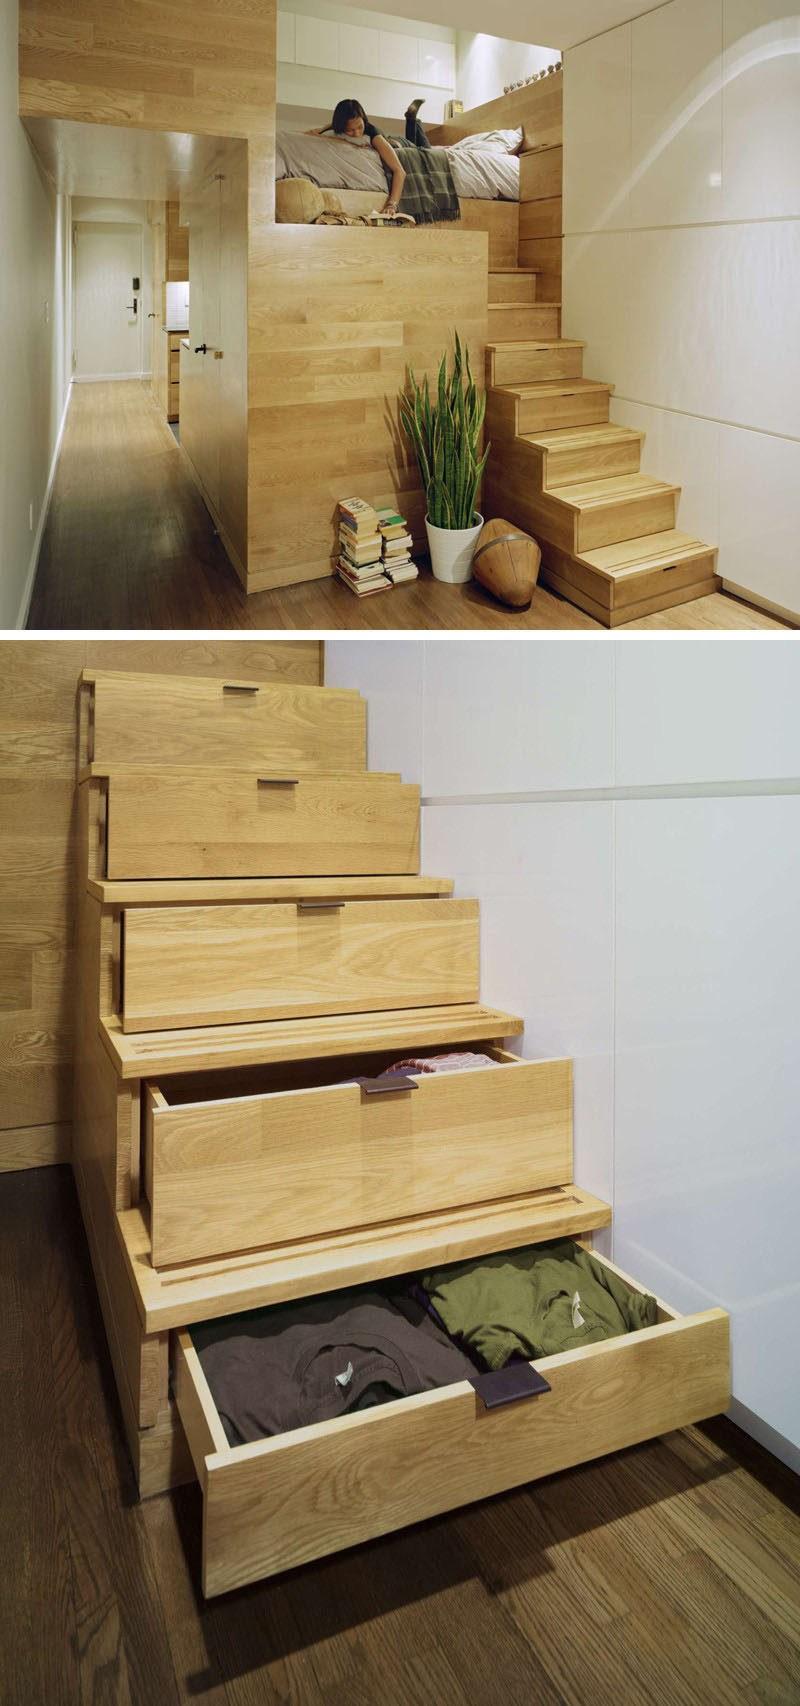 13 Stair Design Ideas For Small Spaces   Staircase Design Near Me   Stair Case   Stair Parts   Handrail   Stair Railing   Interior Design